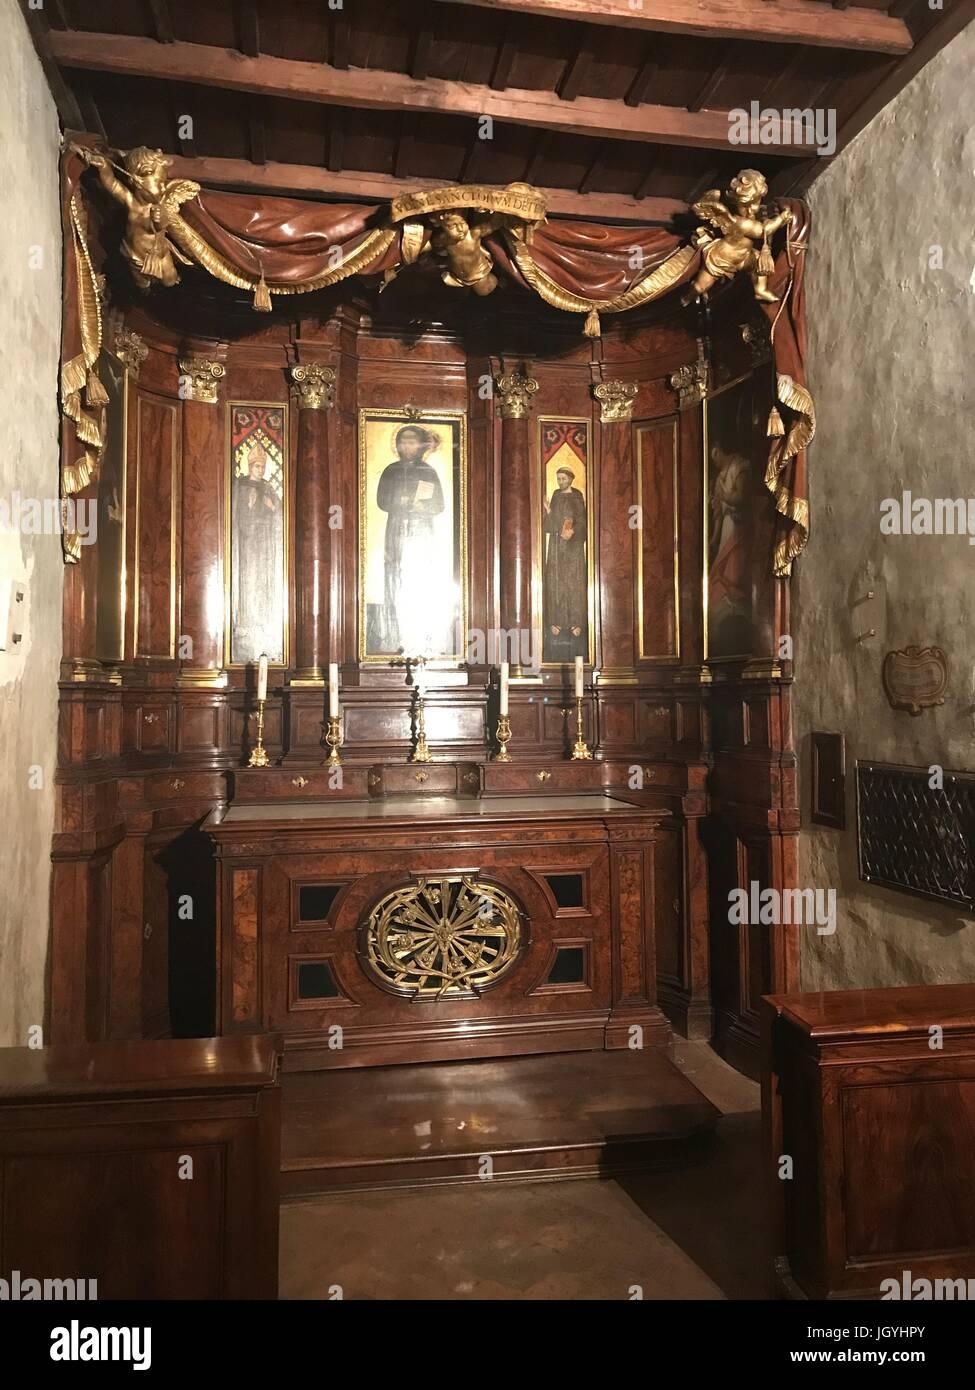 The stone where San Francesco was sleeping in the Church of San Francesco in Ripa in Trastevere, Rome, Italy - Stock Image